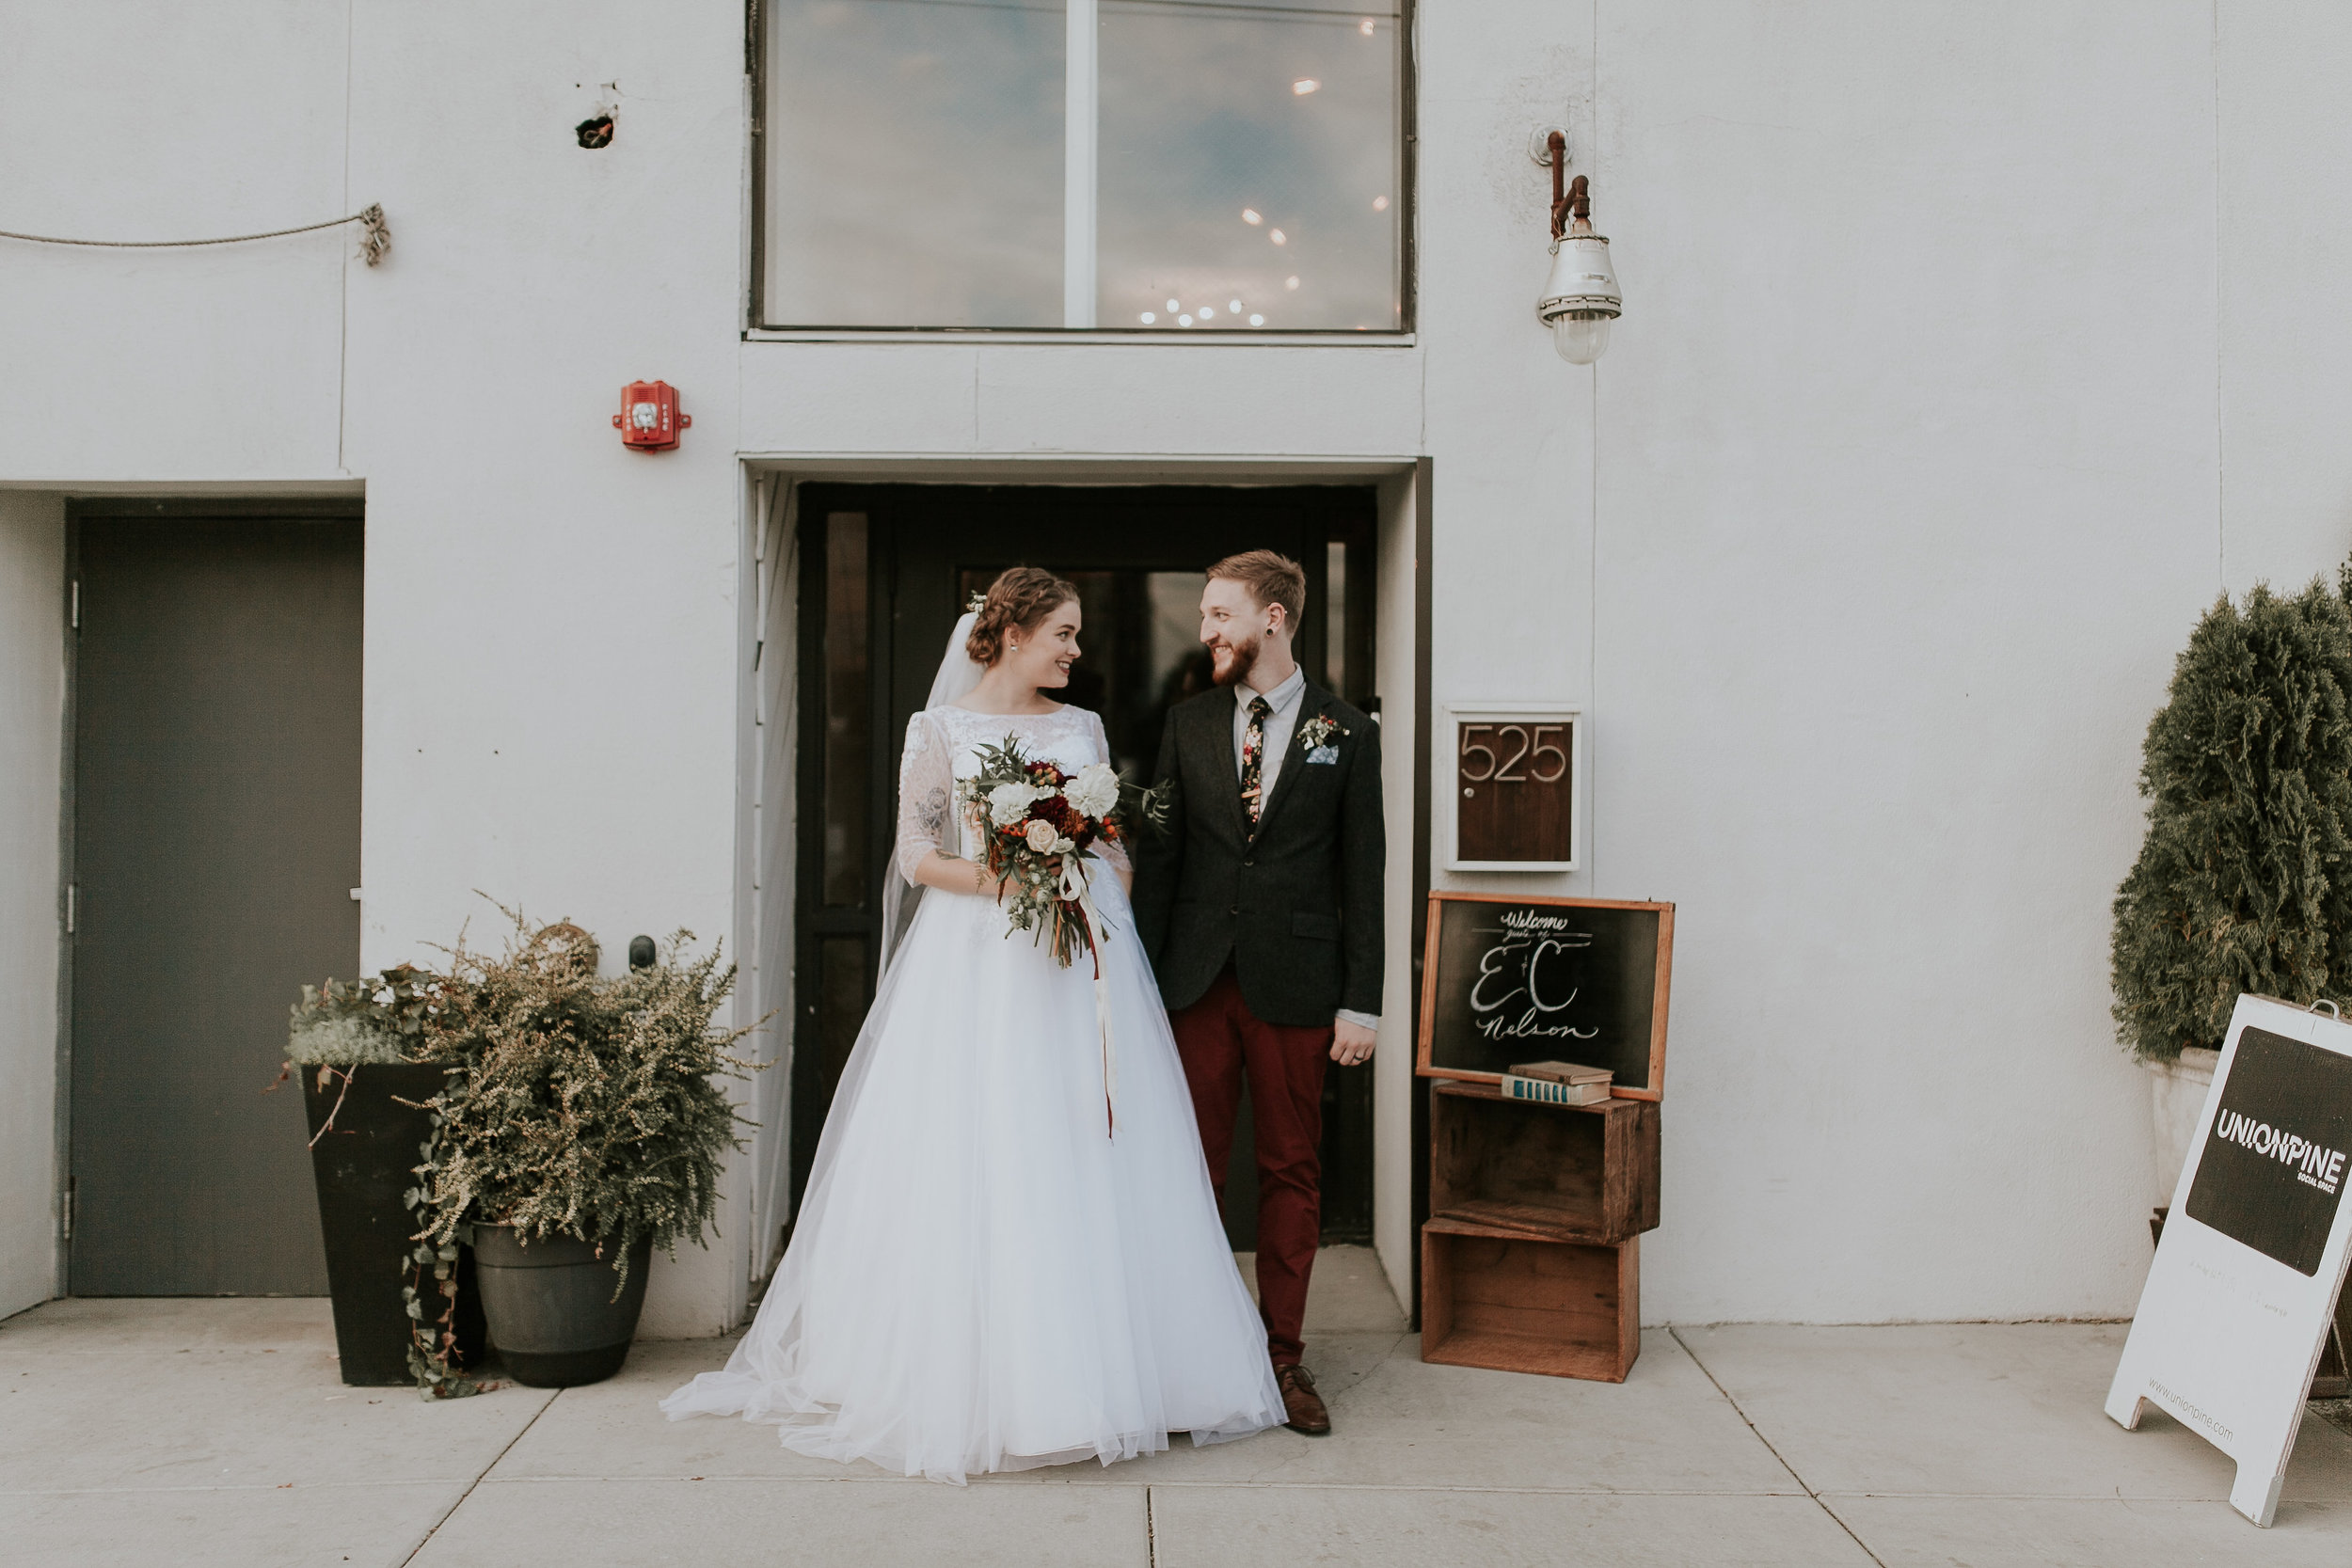 union-pine-wedding-portland-1.jpg